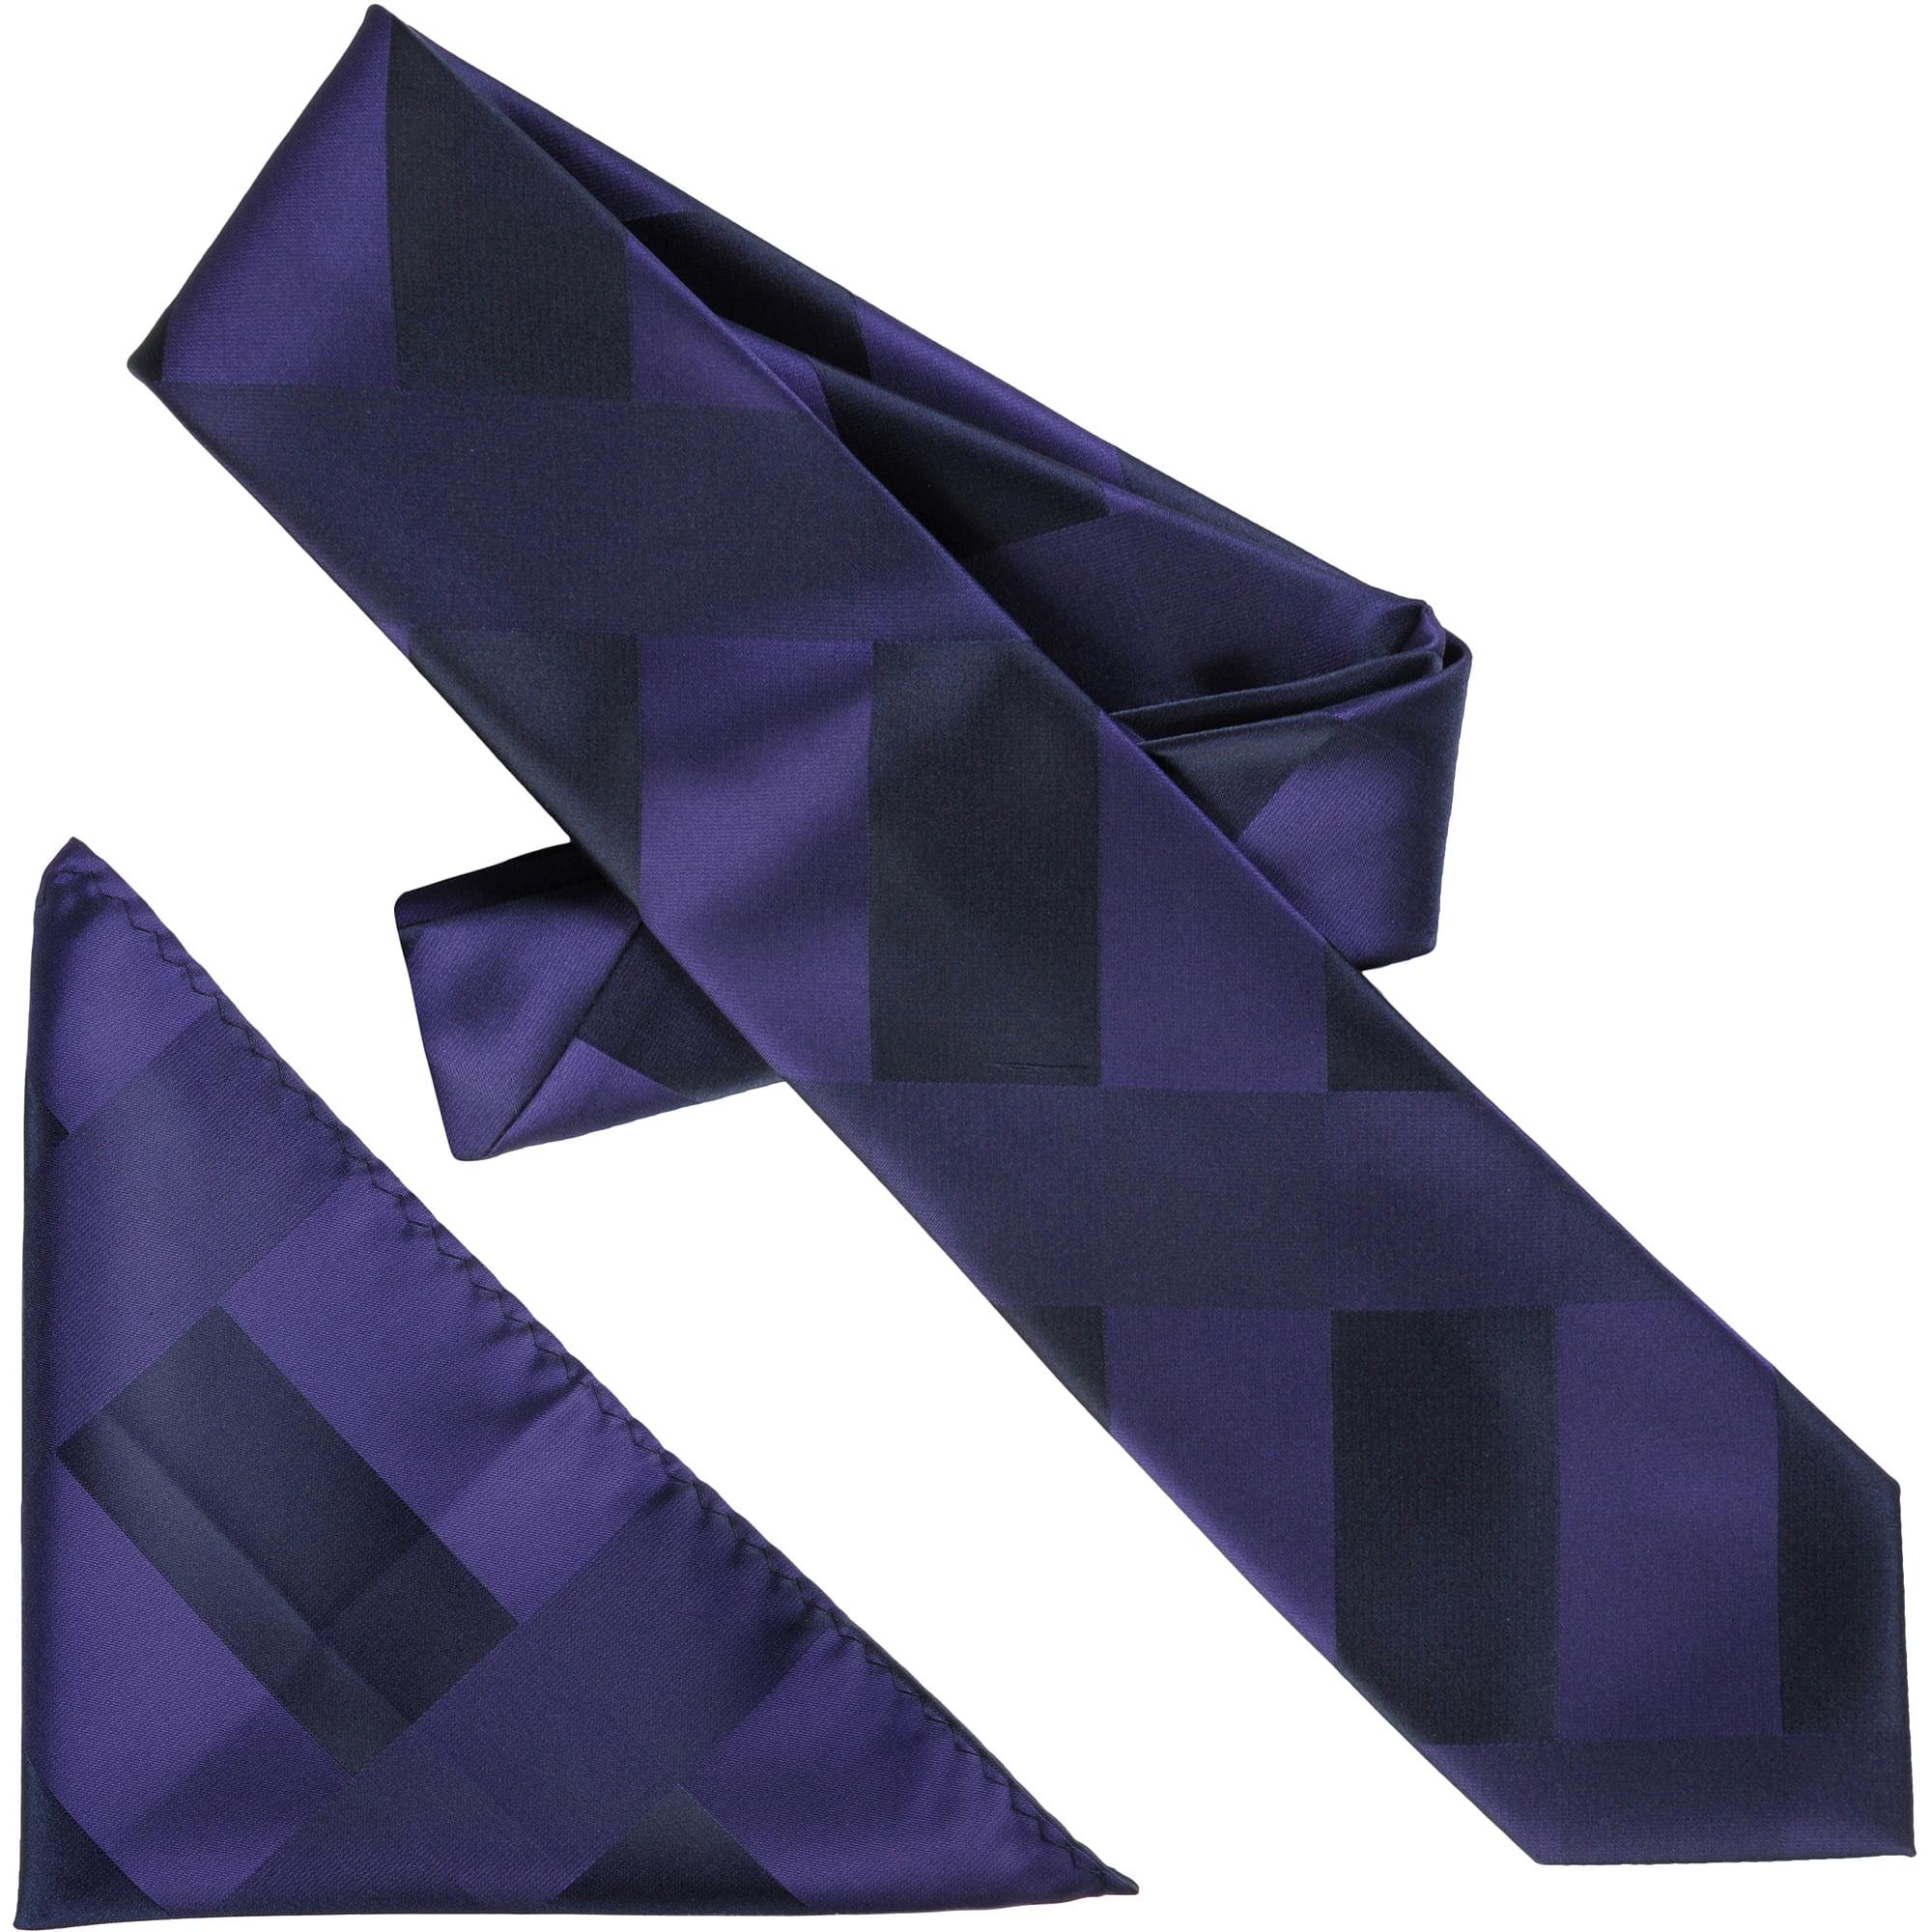 Daxx Men's Mod Print Microfiber Tie and Hanky Set